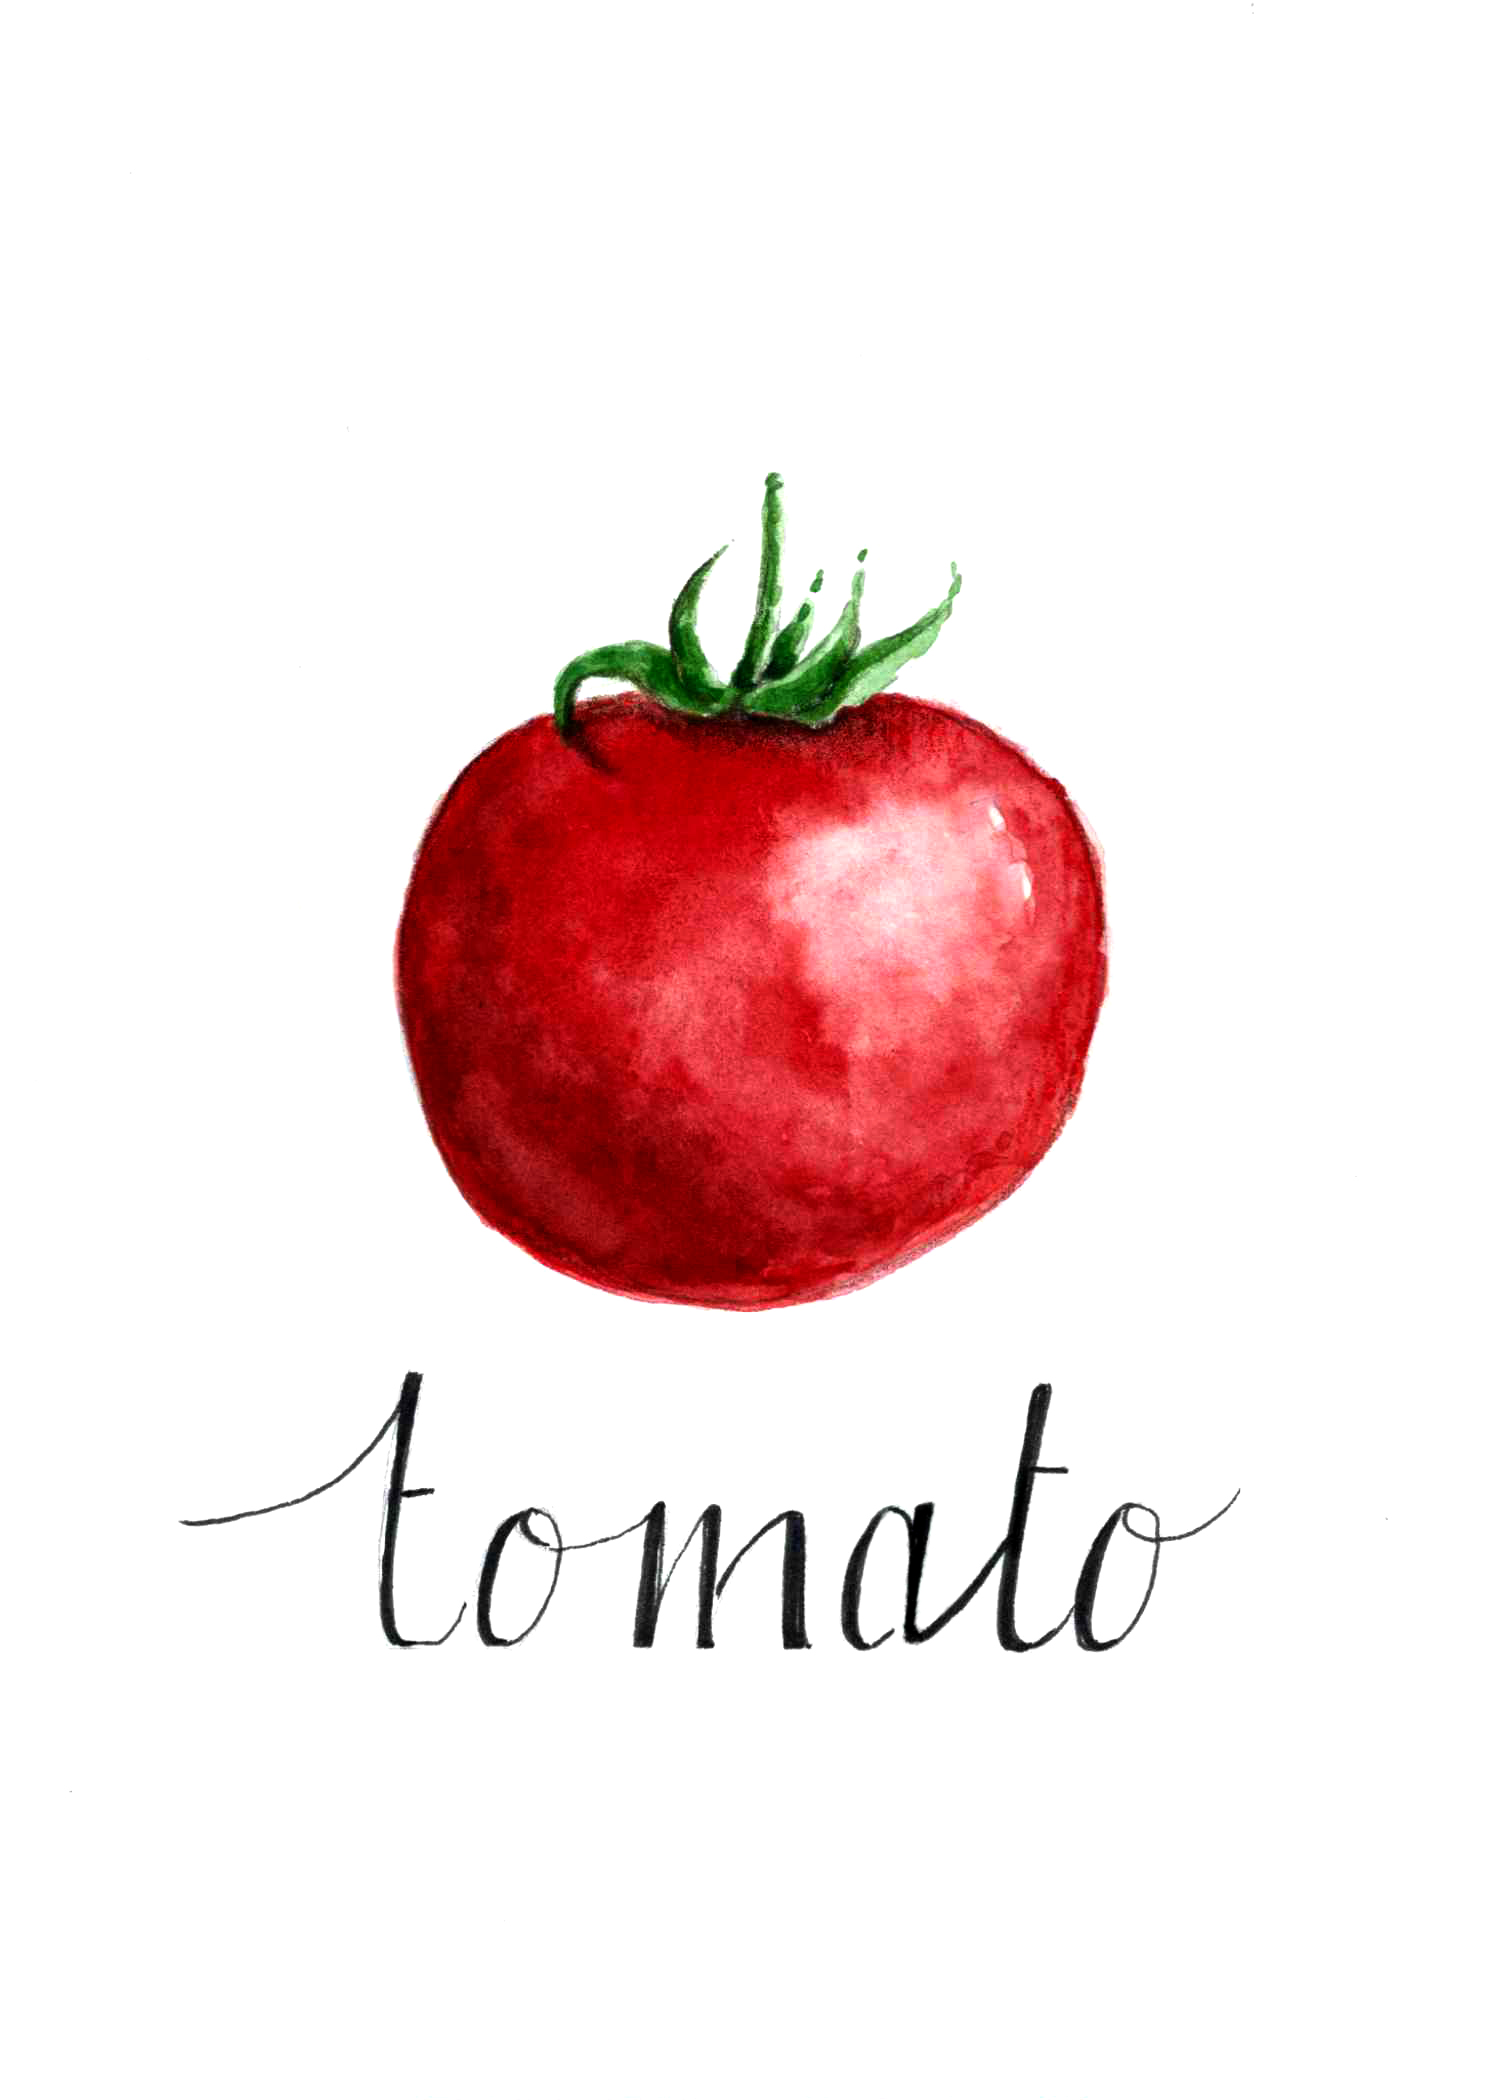 Veggie Series (Tomato)